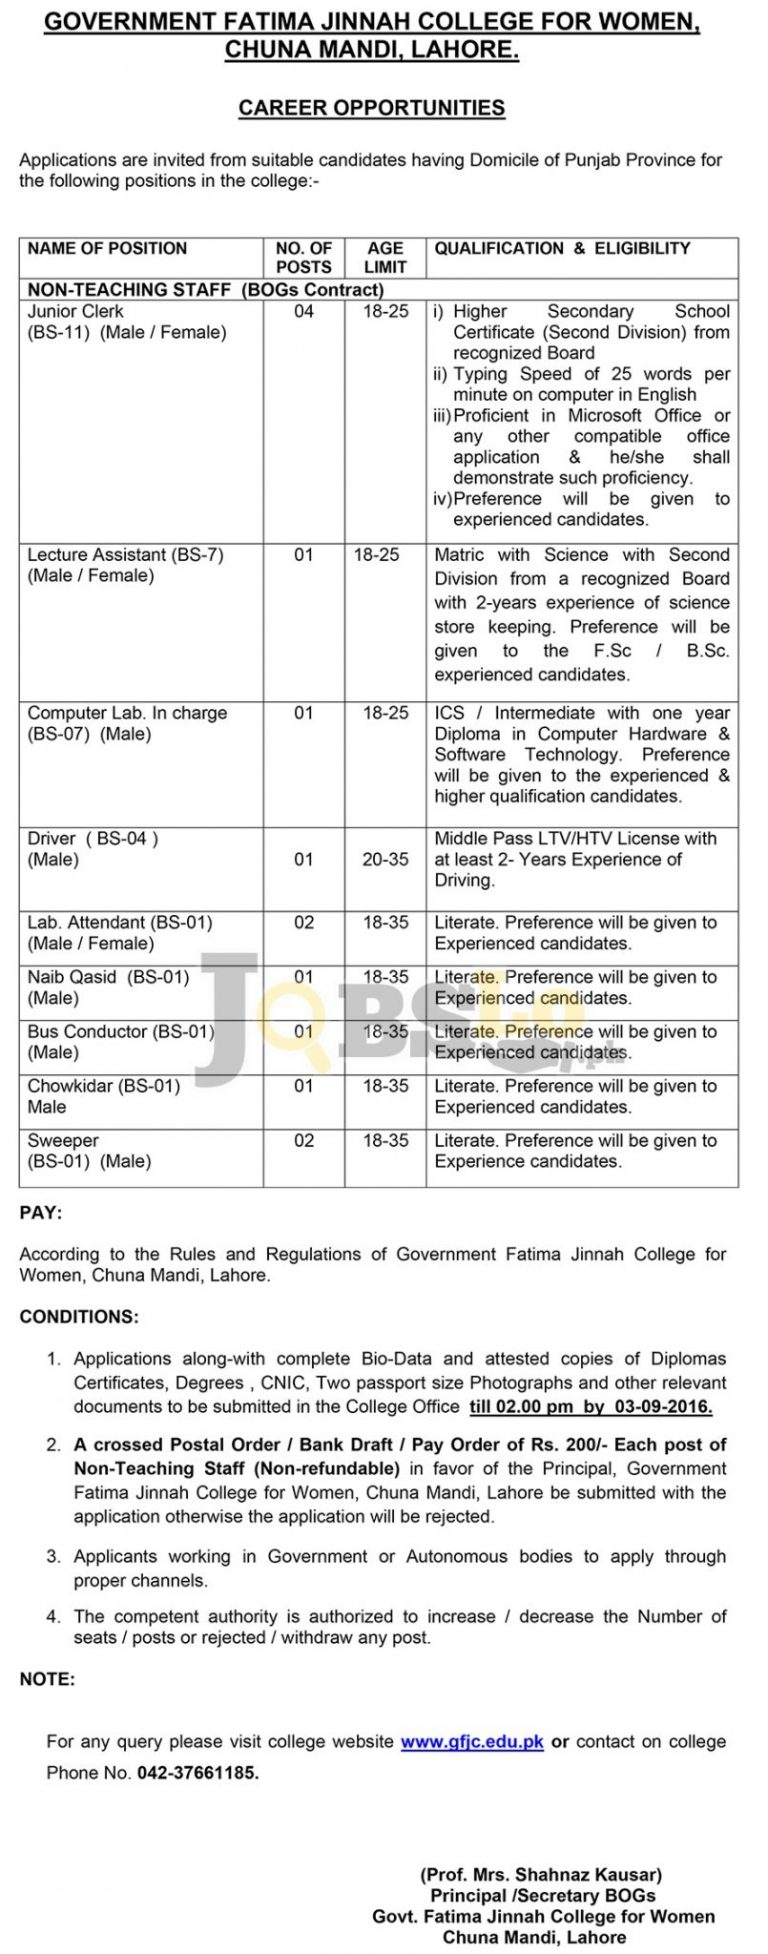 Govt Fatima Jinnah College for Women Lahore Jobs 2016 Current Career Opportunities